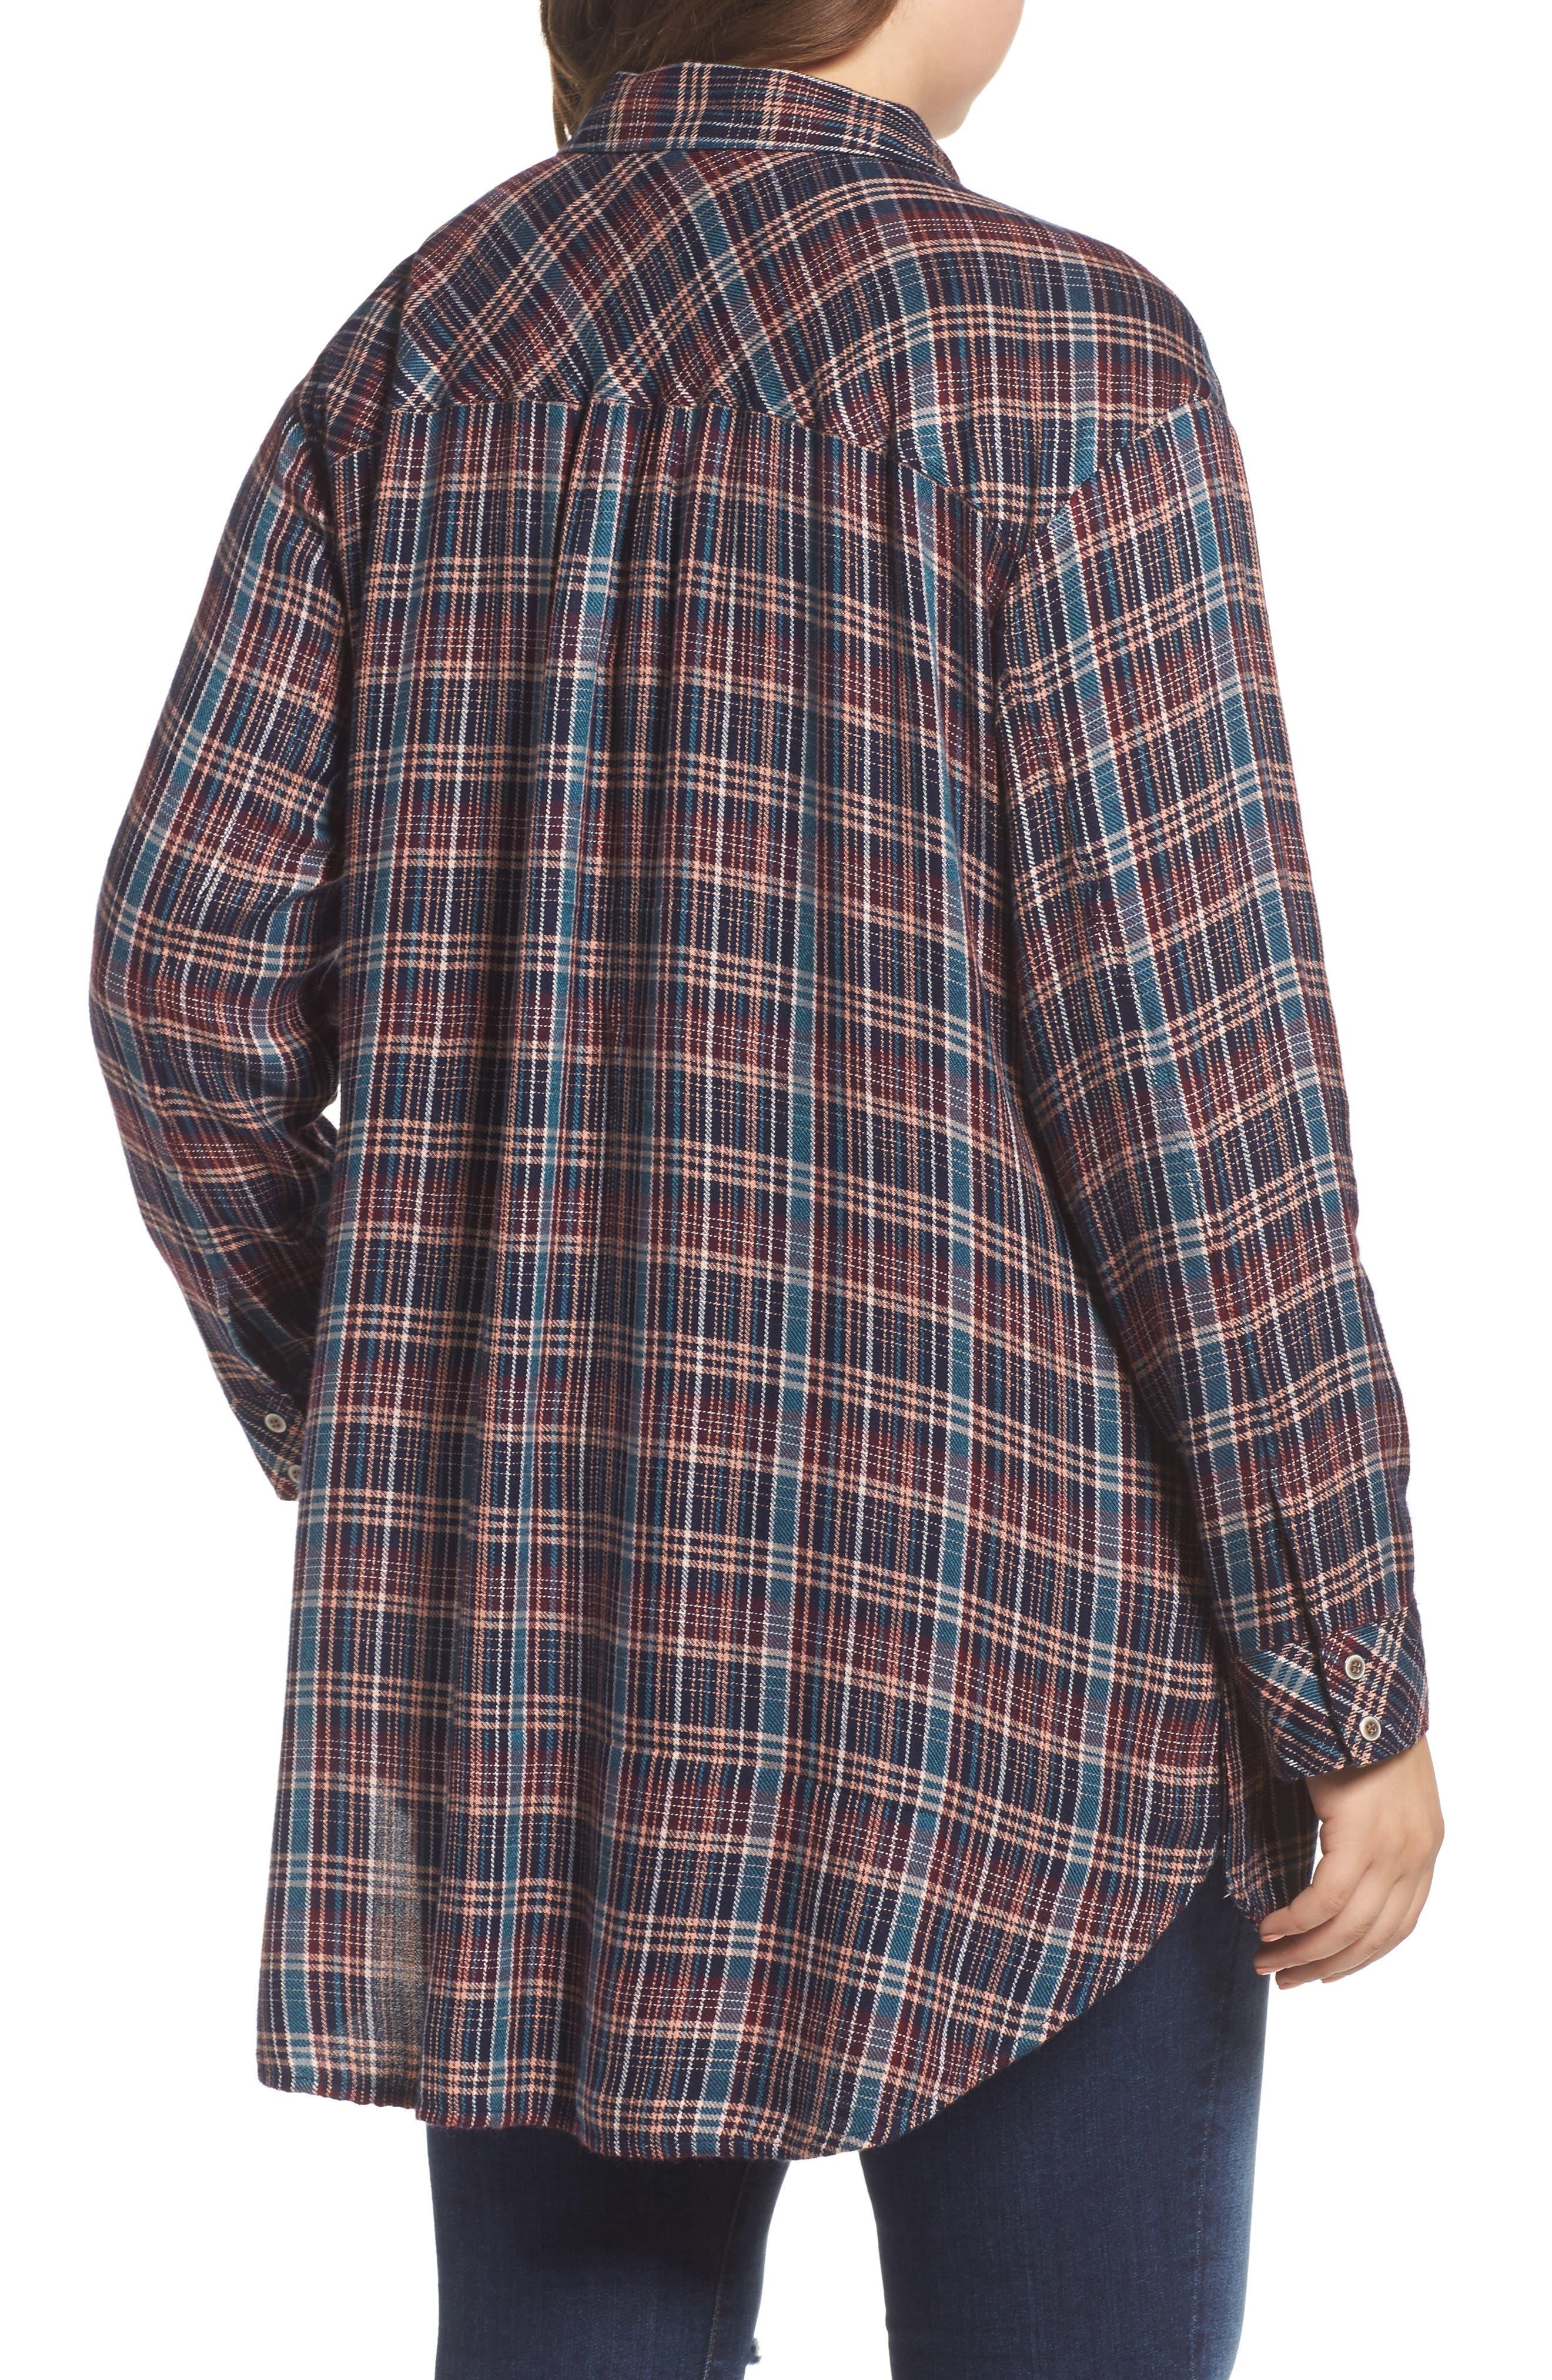 Button Side Detail Tunic Shirt,                             Alternate thumbnail 2, color,                             Navy Karen Plaid